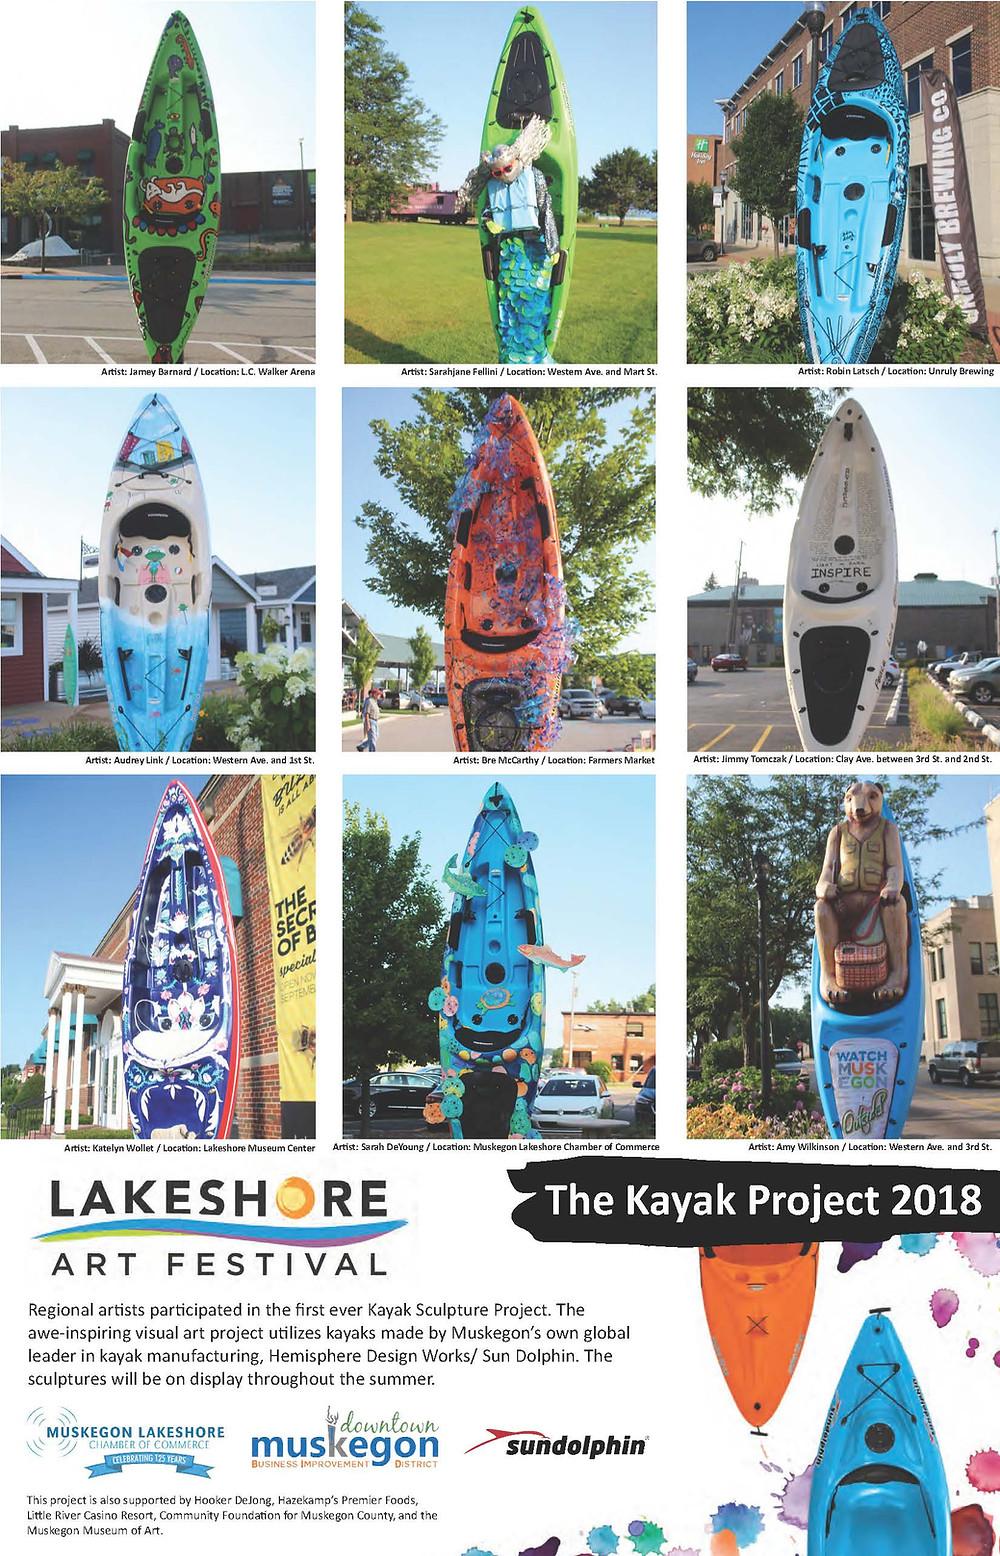 Lakeshore Art Festival Kayak Project 2018